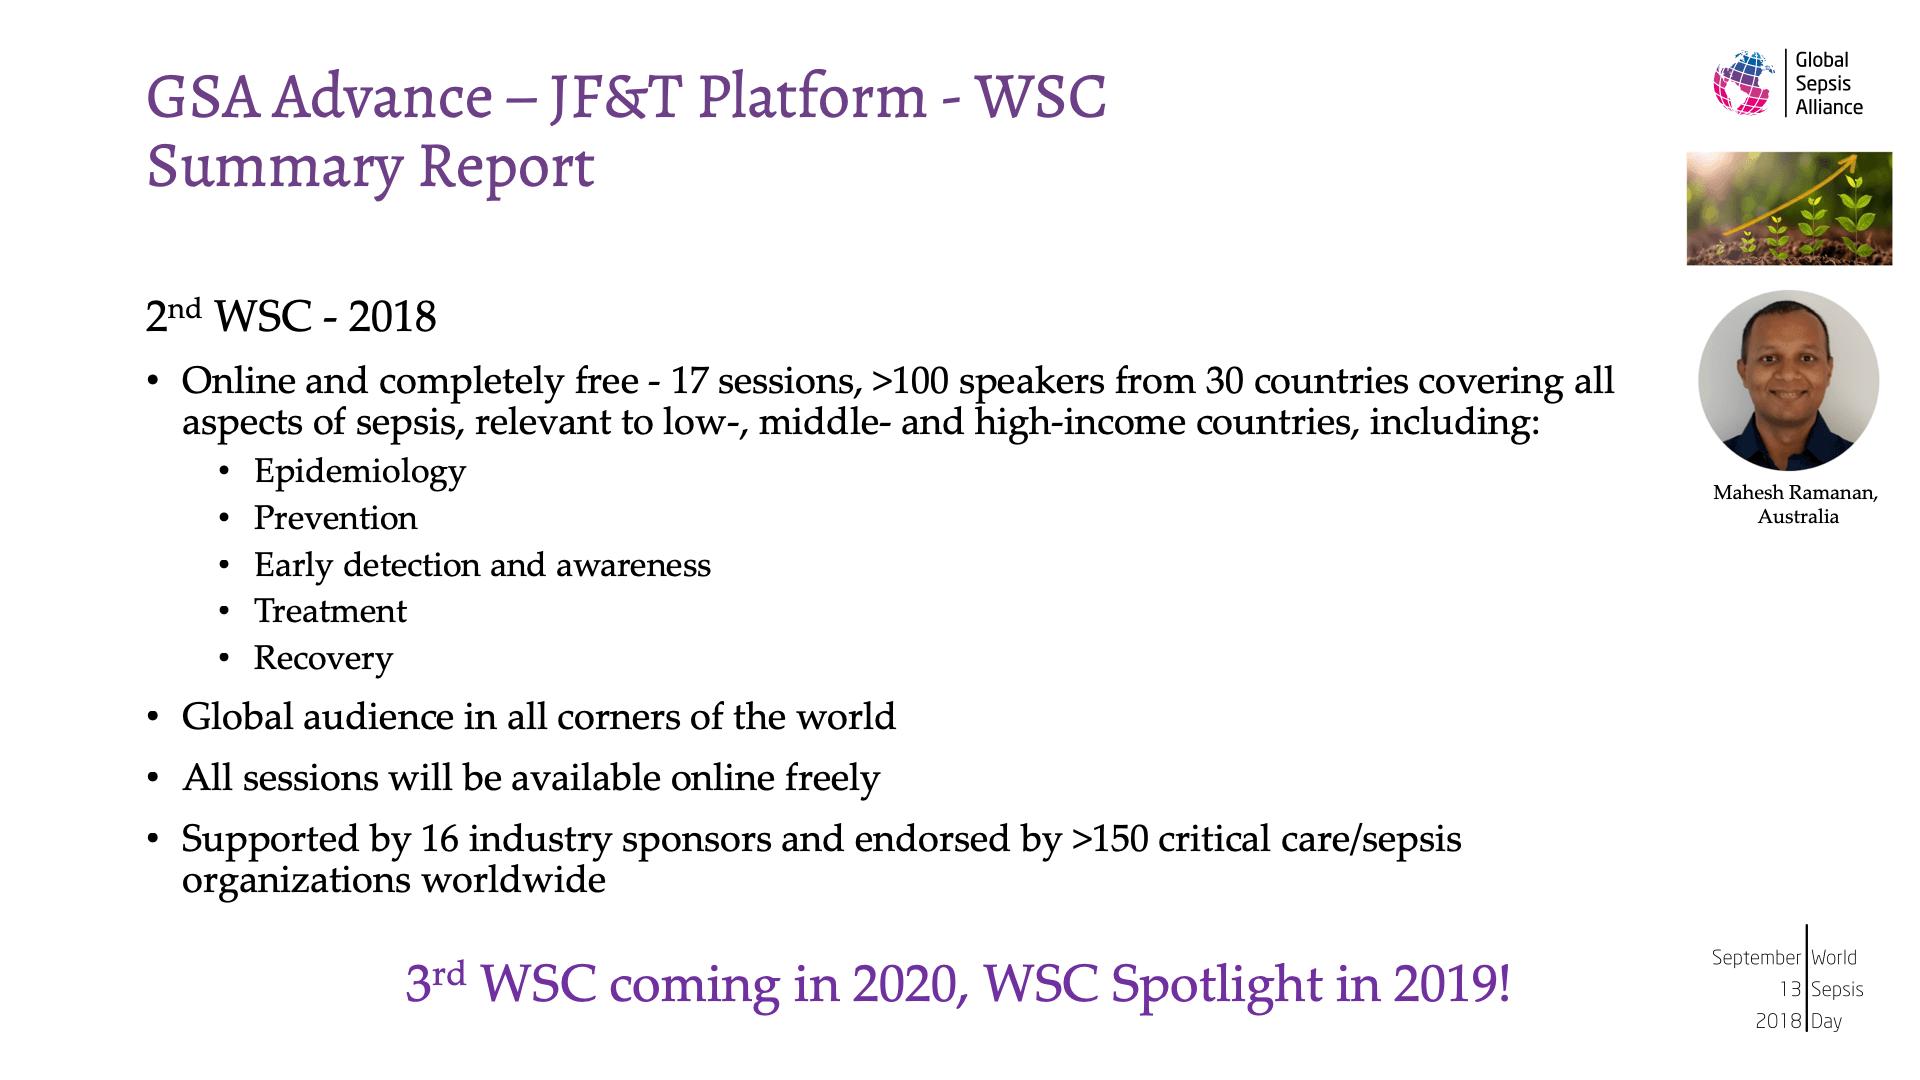 GSA Advance ESICM 2018 9.png